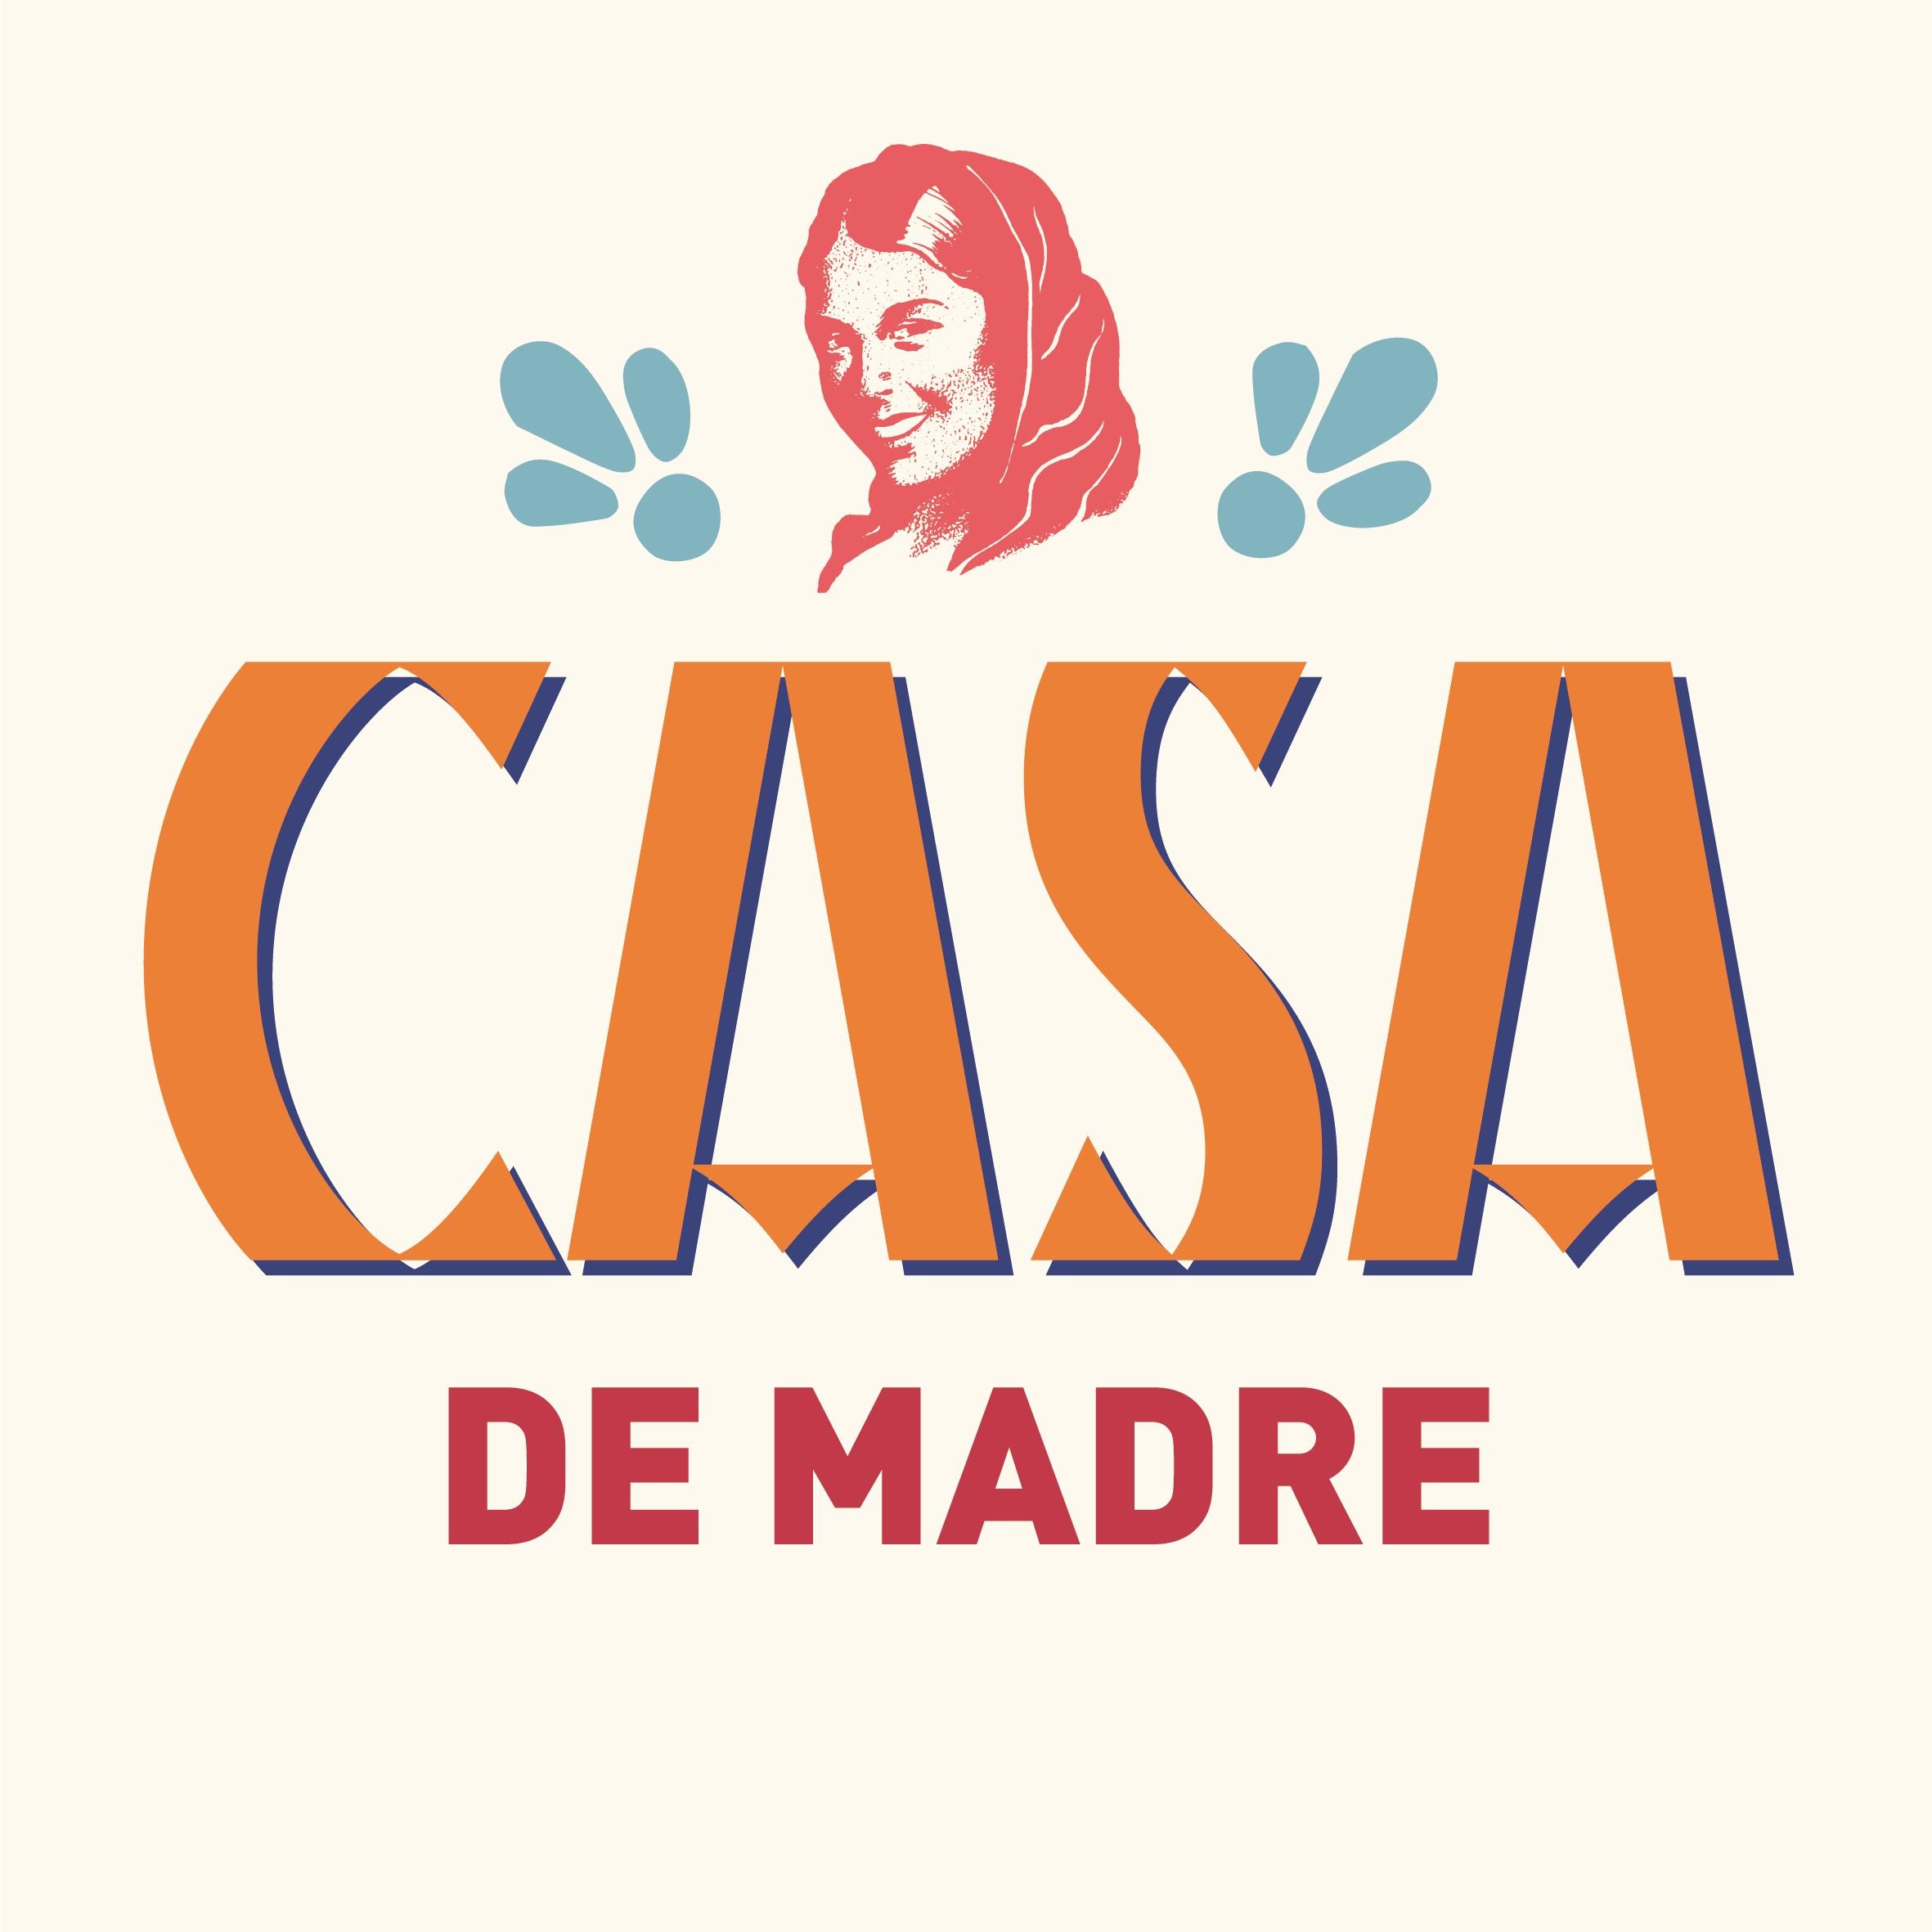 CASA+DE+MADRE+logo-01.jpg